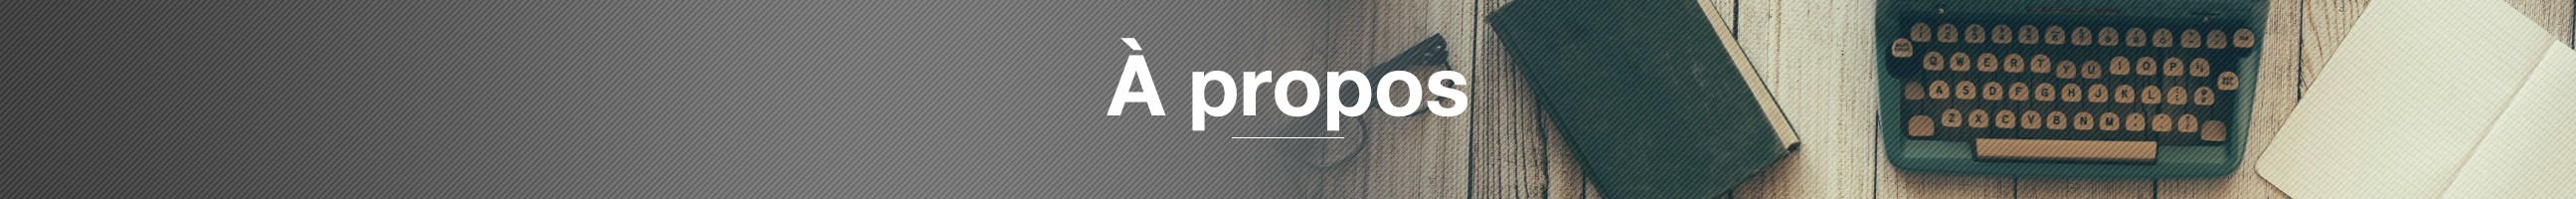 Bandeau-a-PROPOS-V4